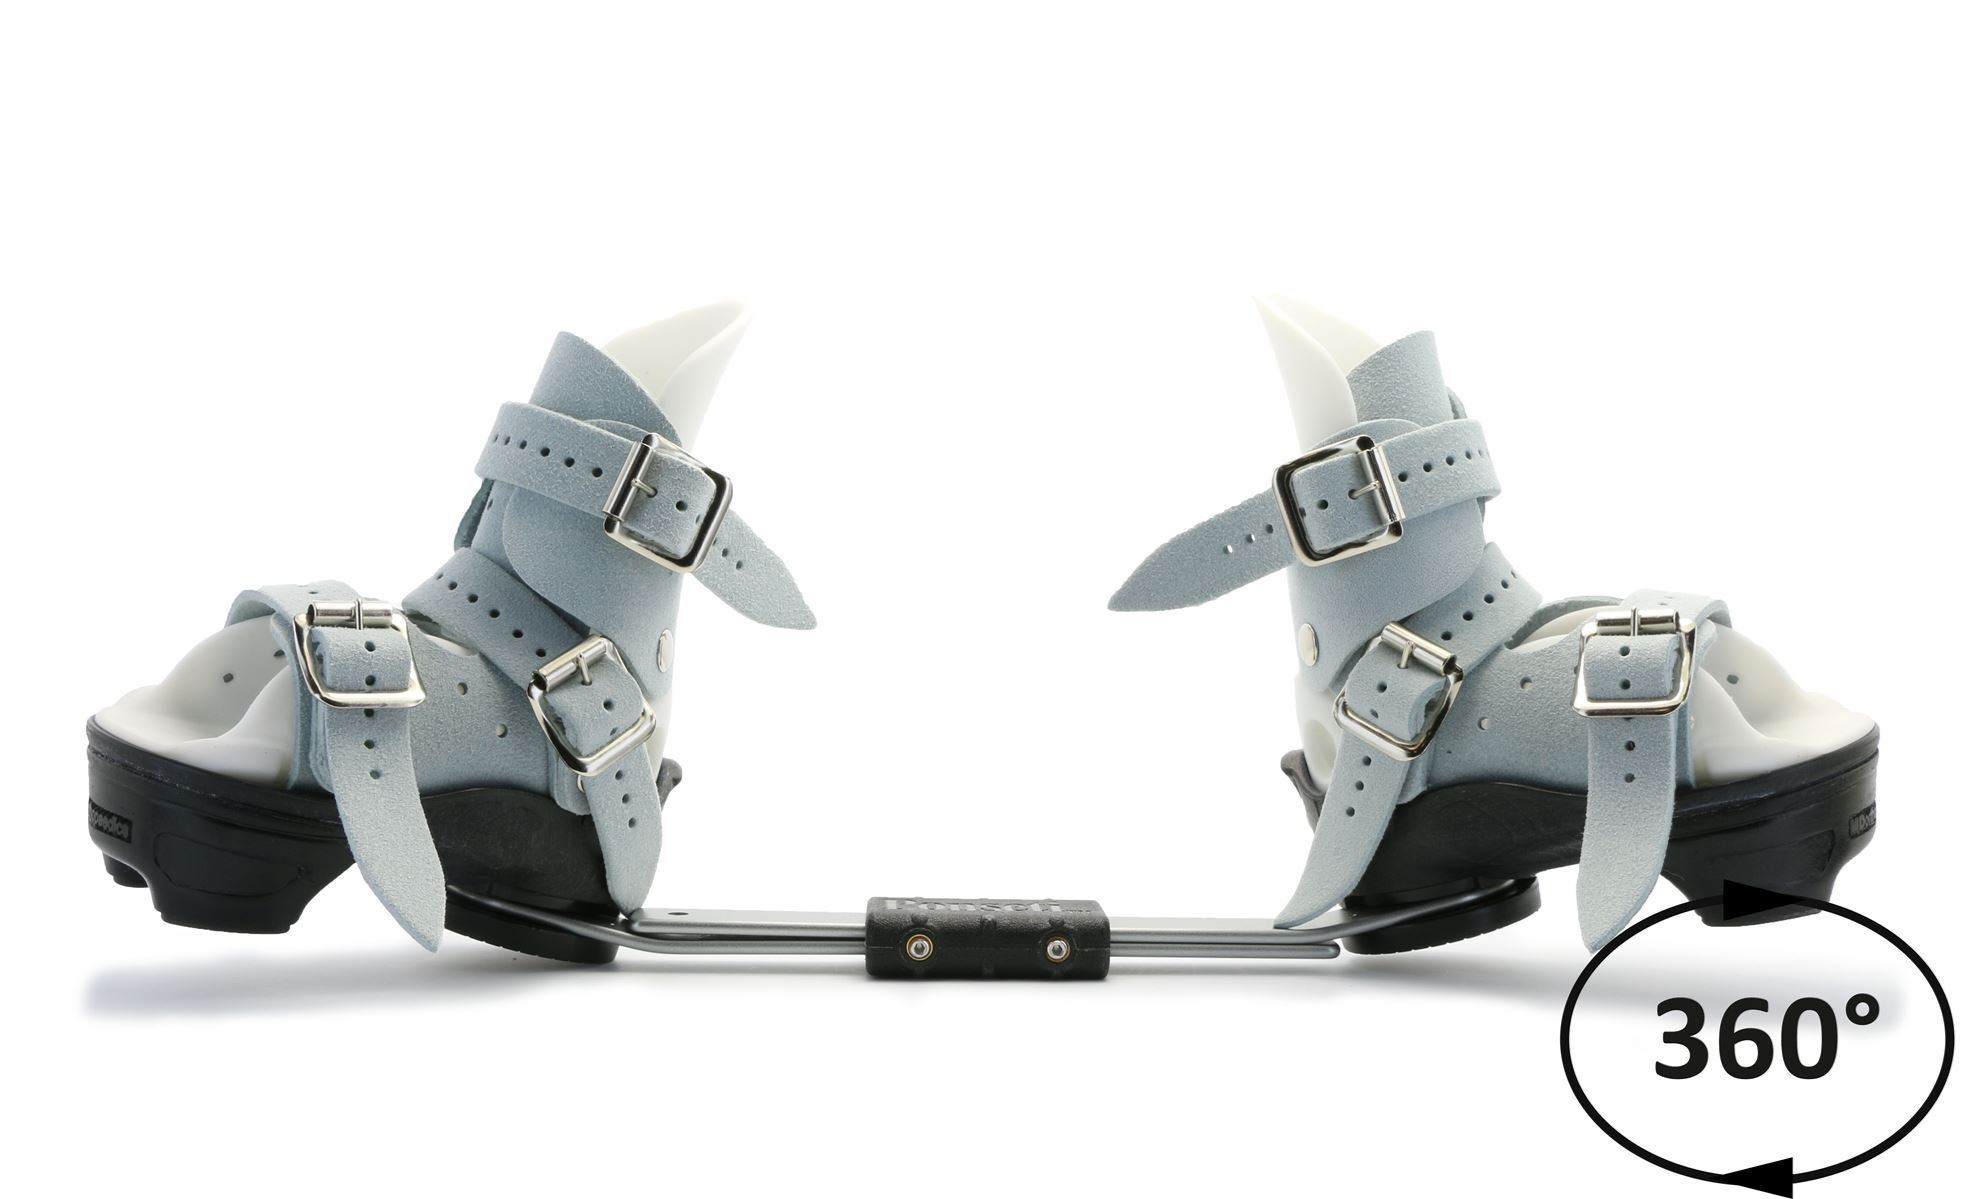 Ponseti AFO Toe Stilt Sandals with Bar